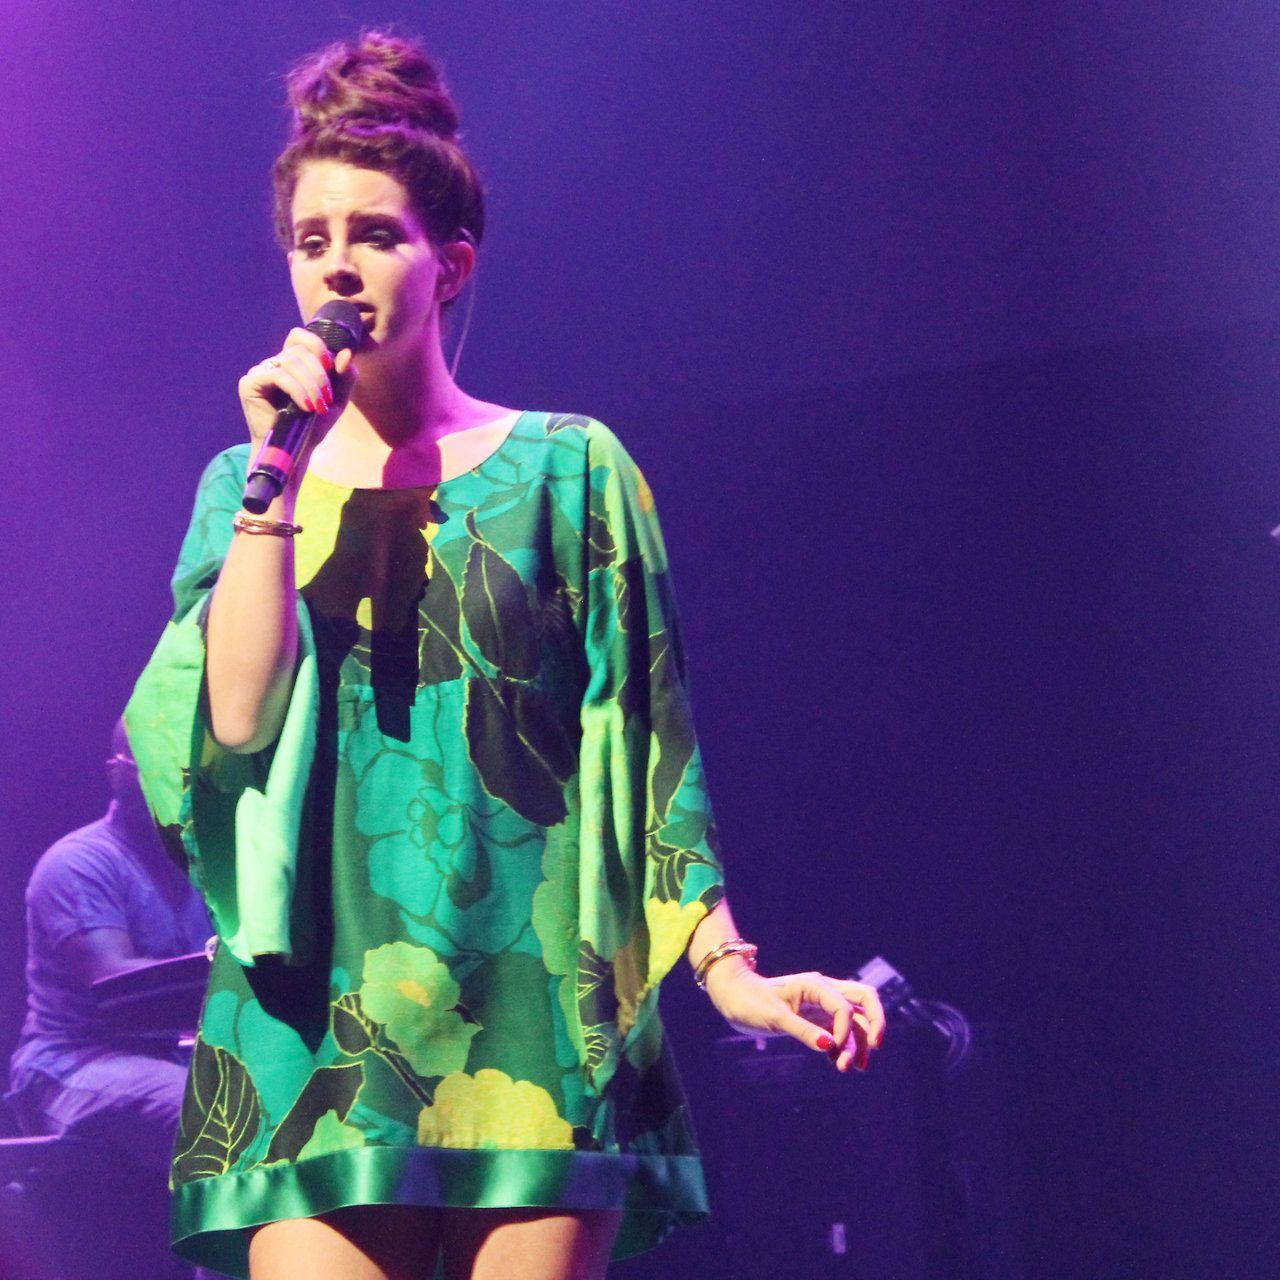 Lana Del Rey in Paris